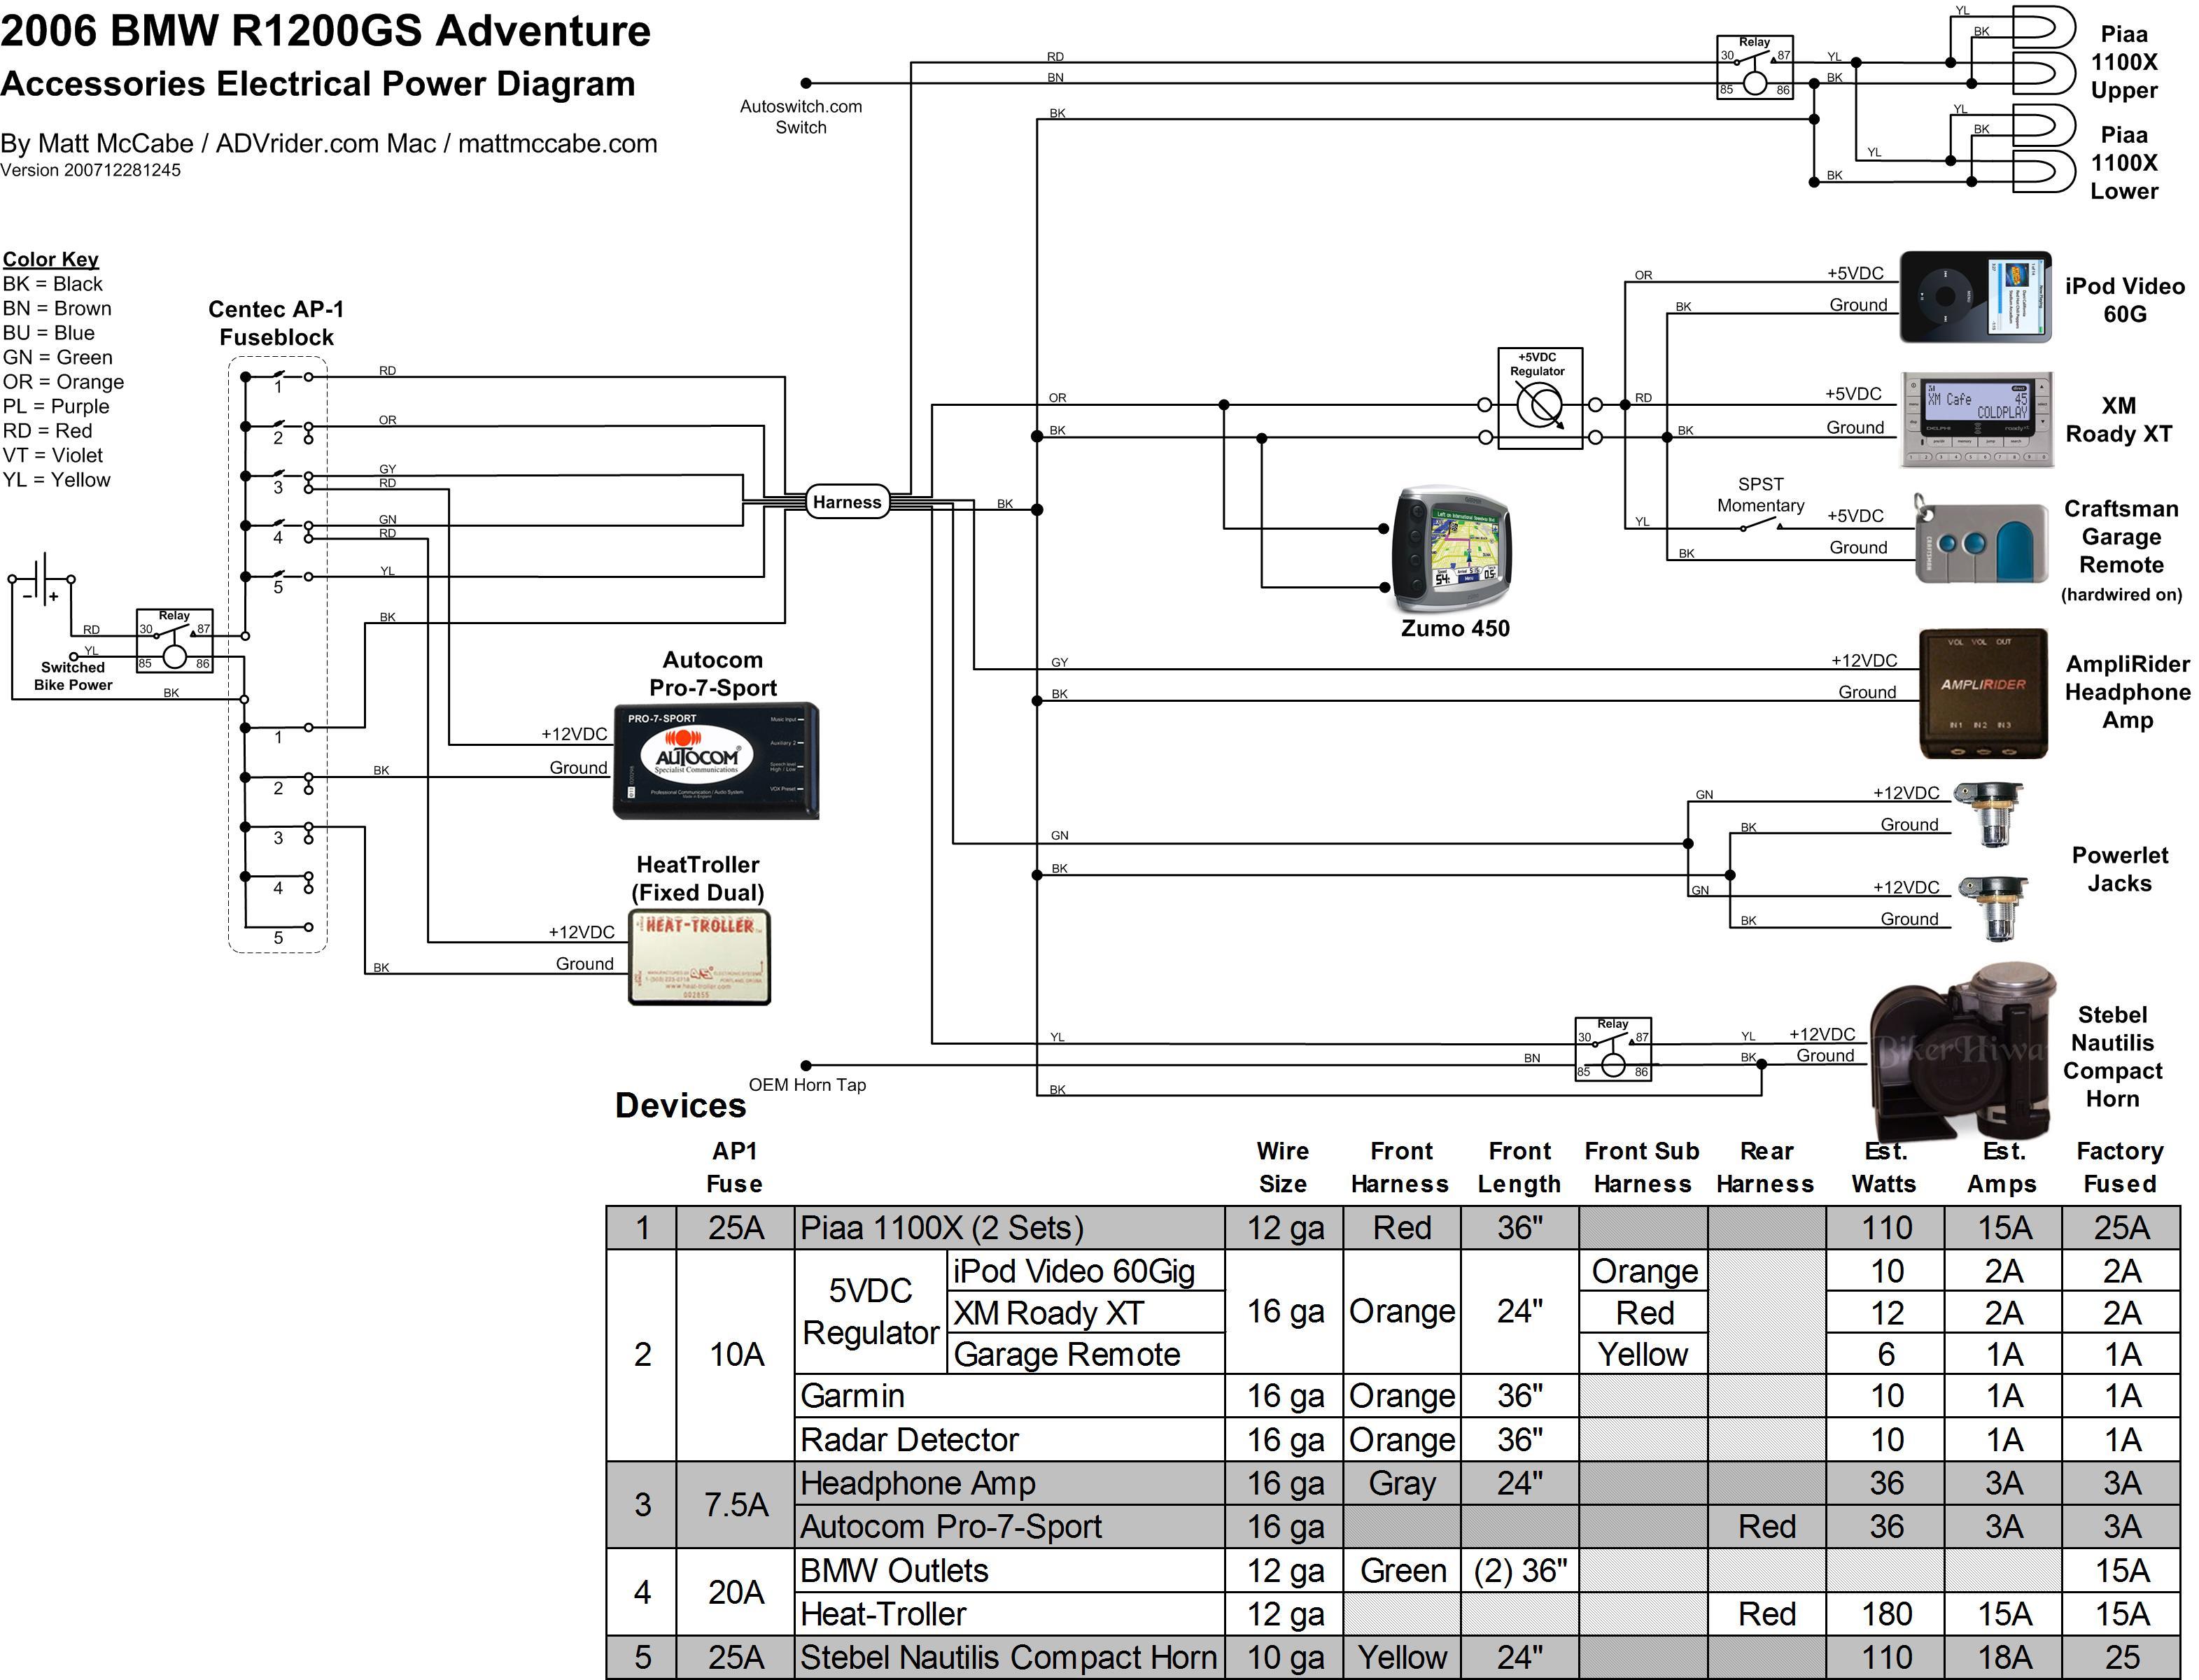 Contemporary Ecu Pinout Diagram For 2007 Mini Cooper S R56 Engine ...